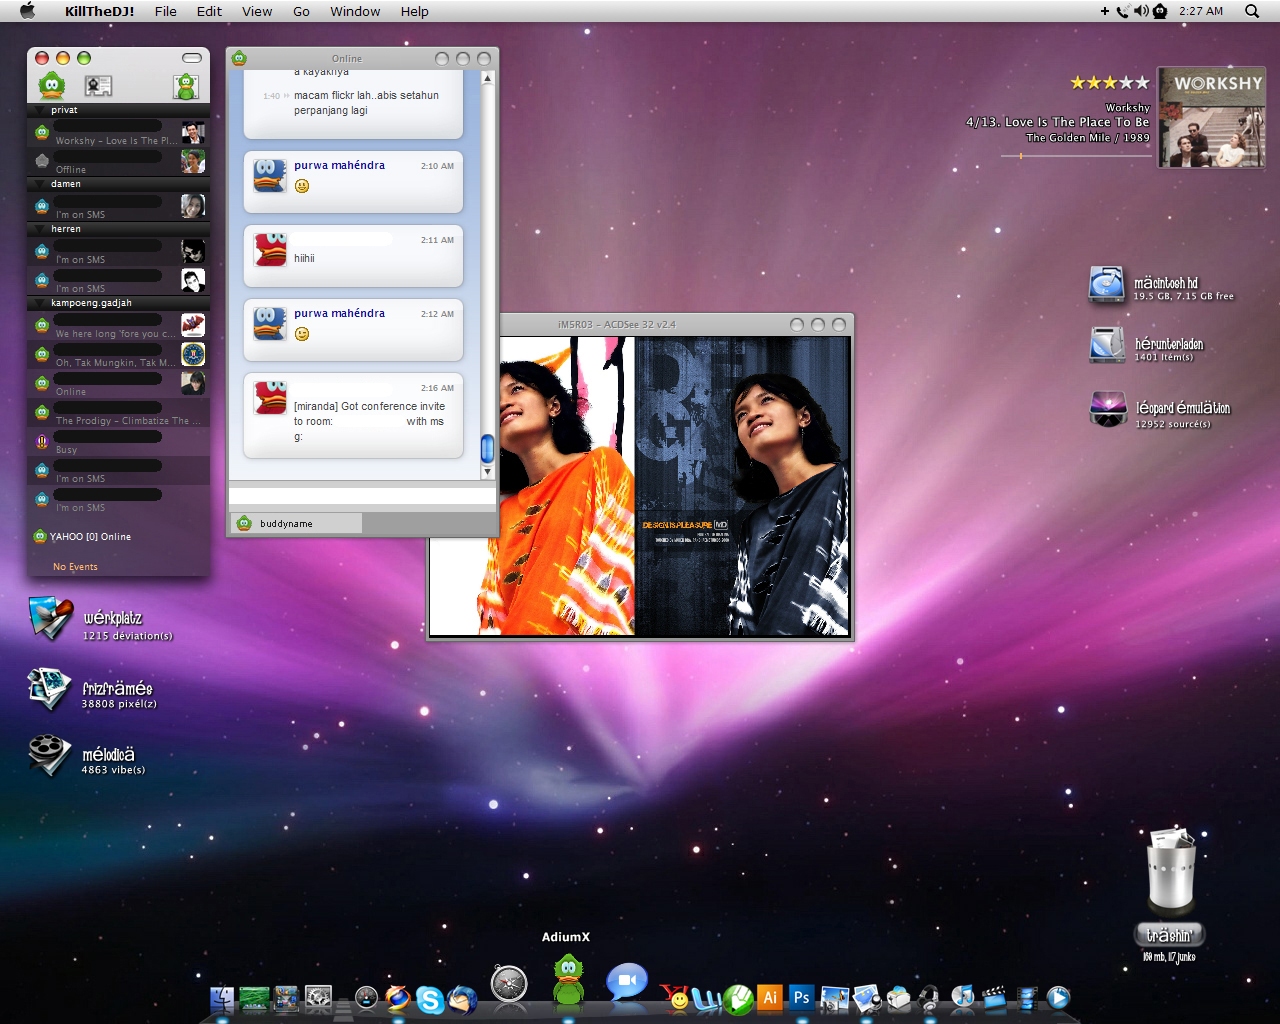 AdiumX Style on XP